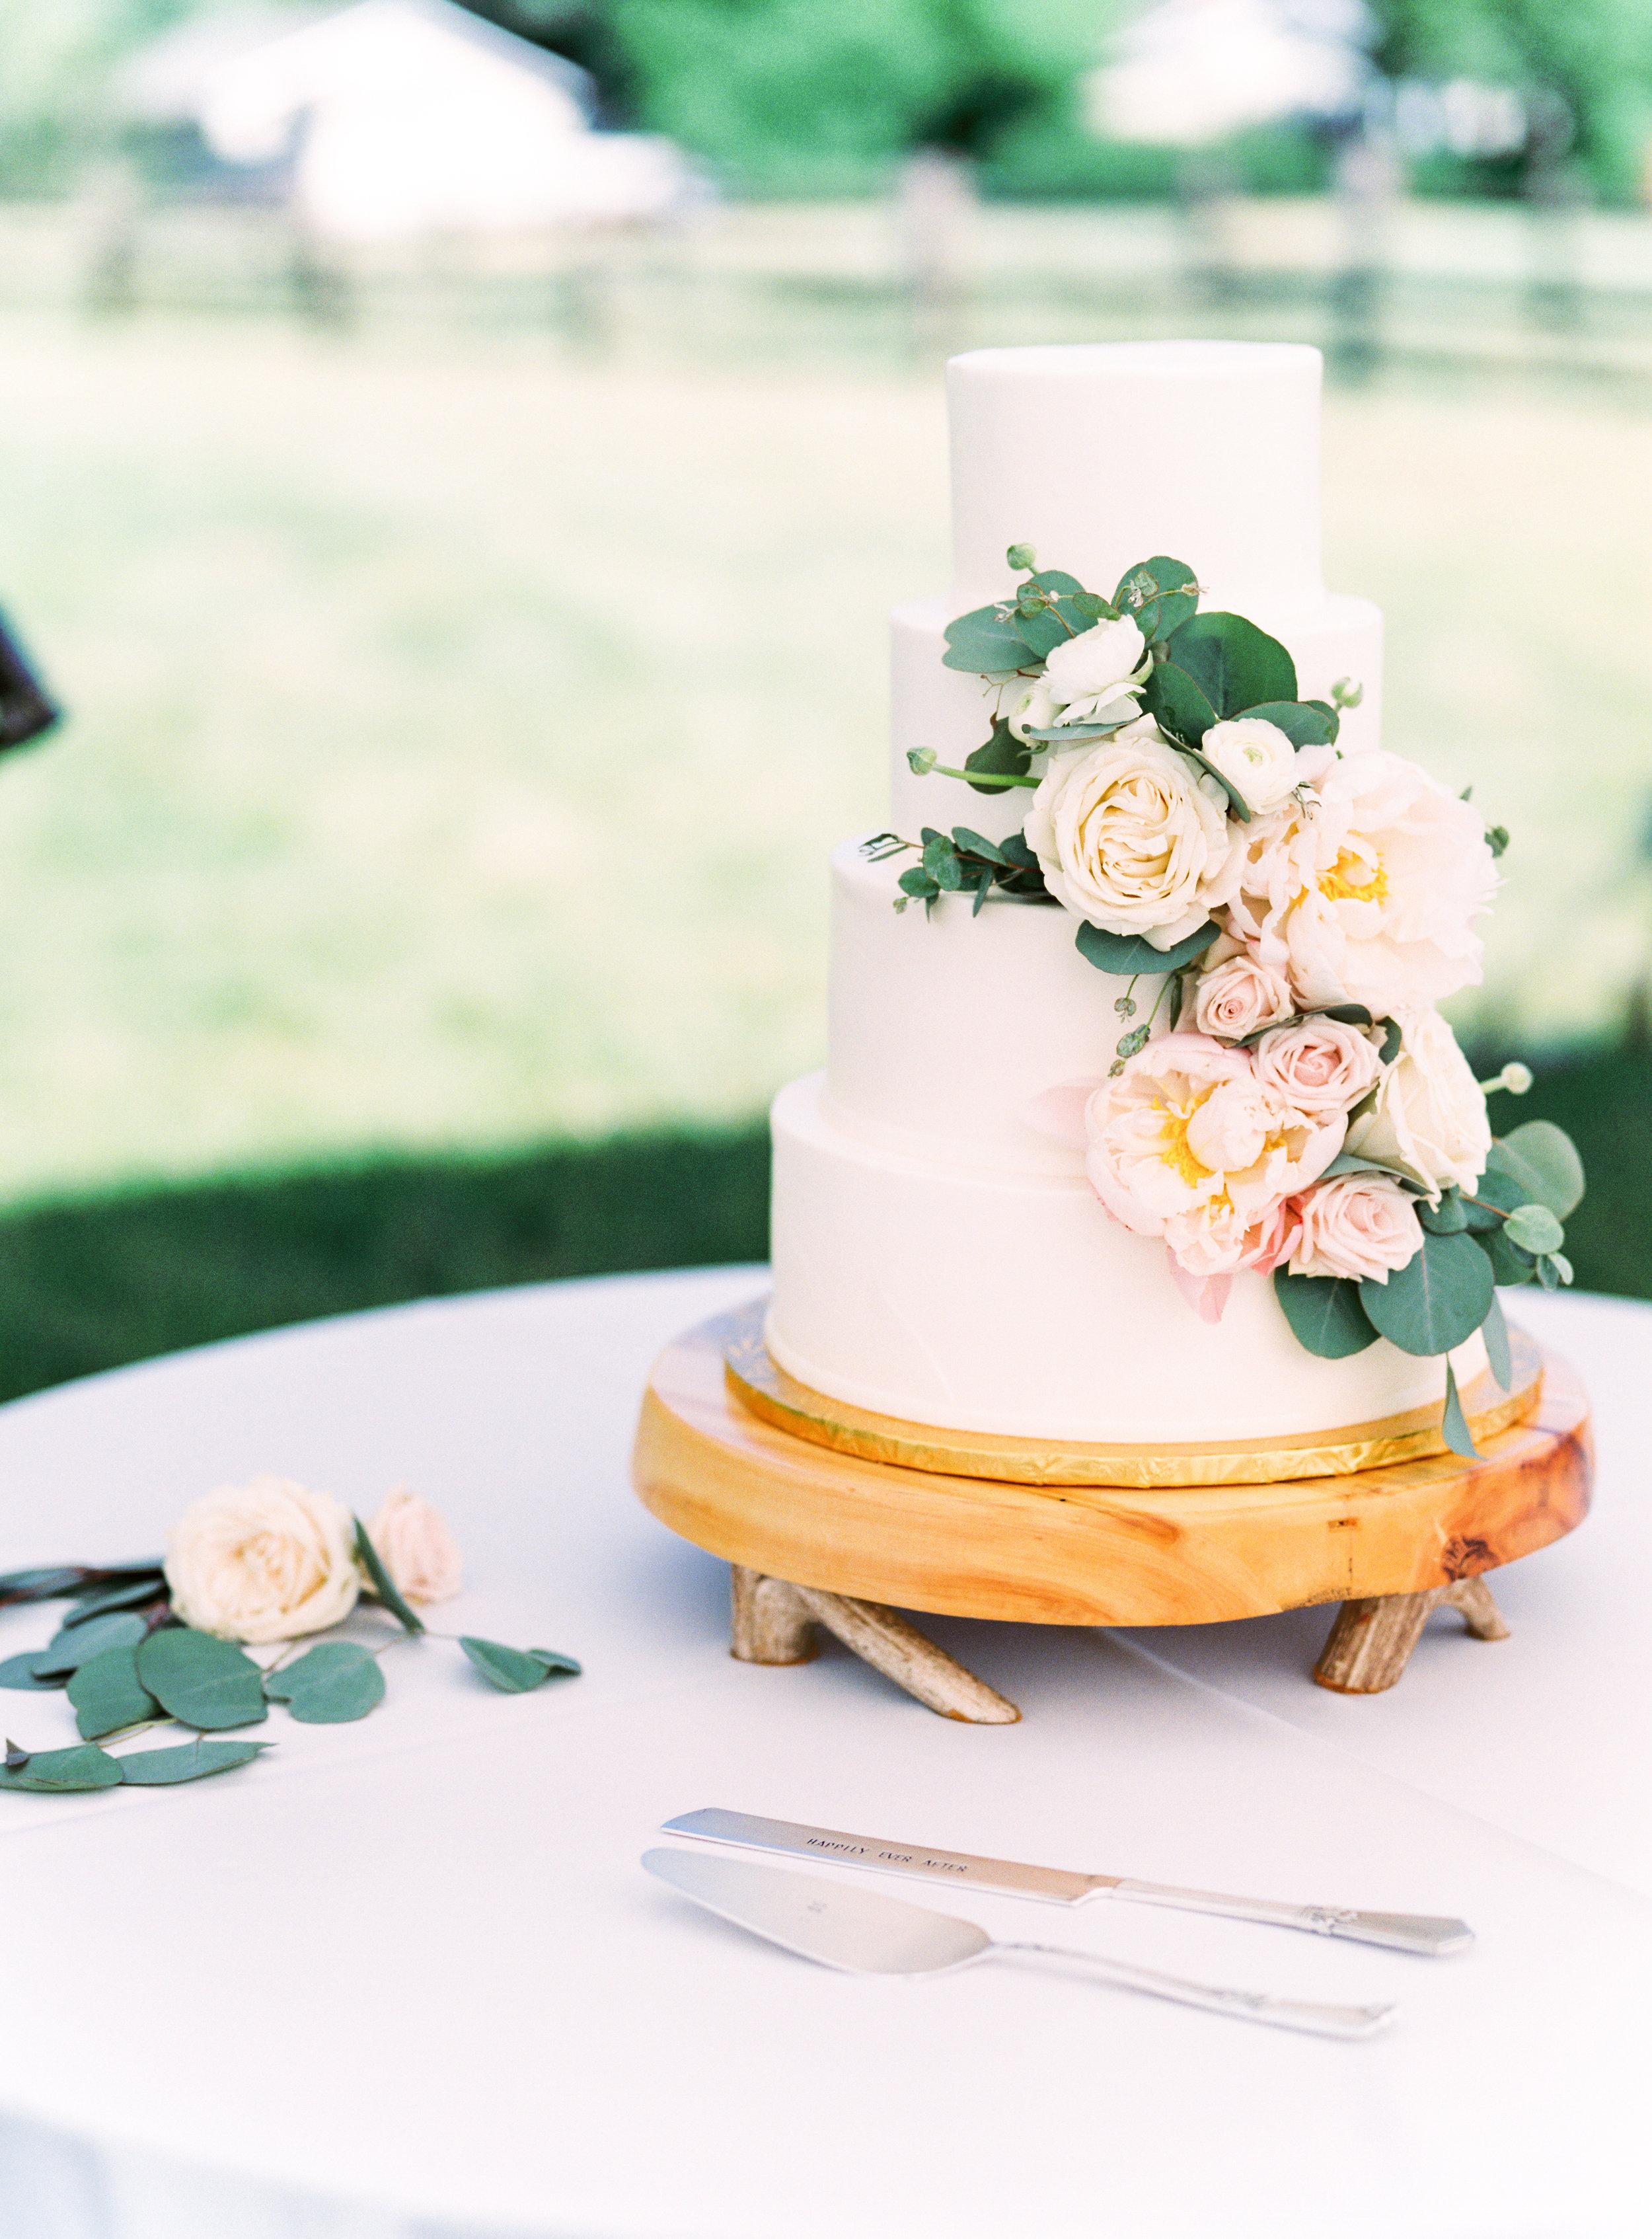 Kathryn-Allen-Boulder-wedding-2018-by-Lisa-ODwyer-498.jpg